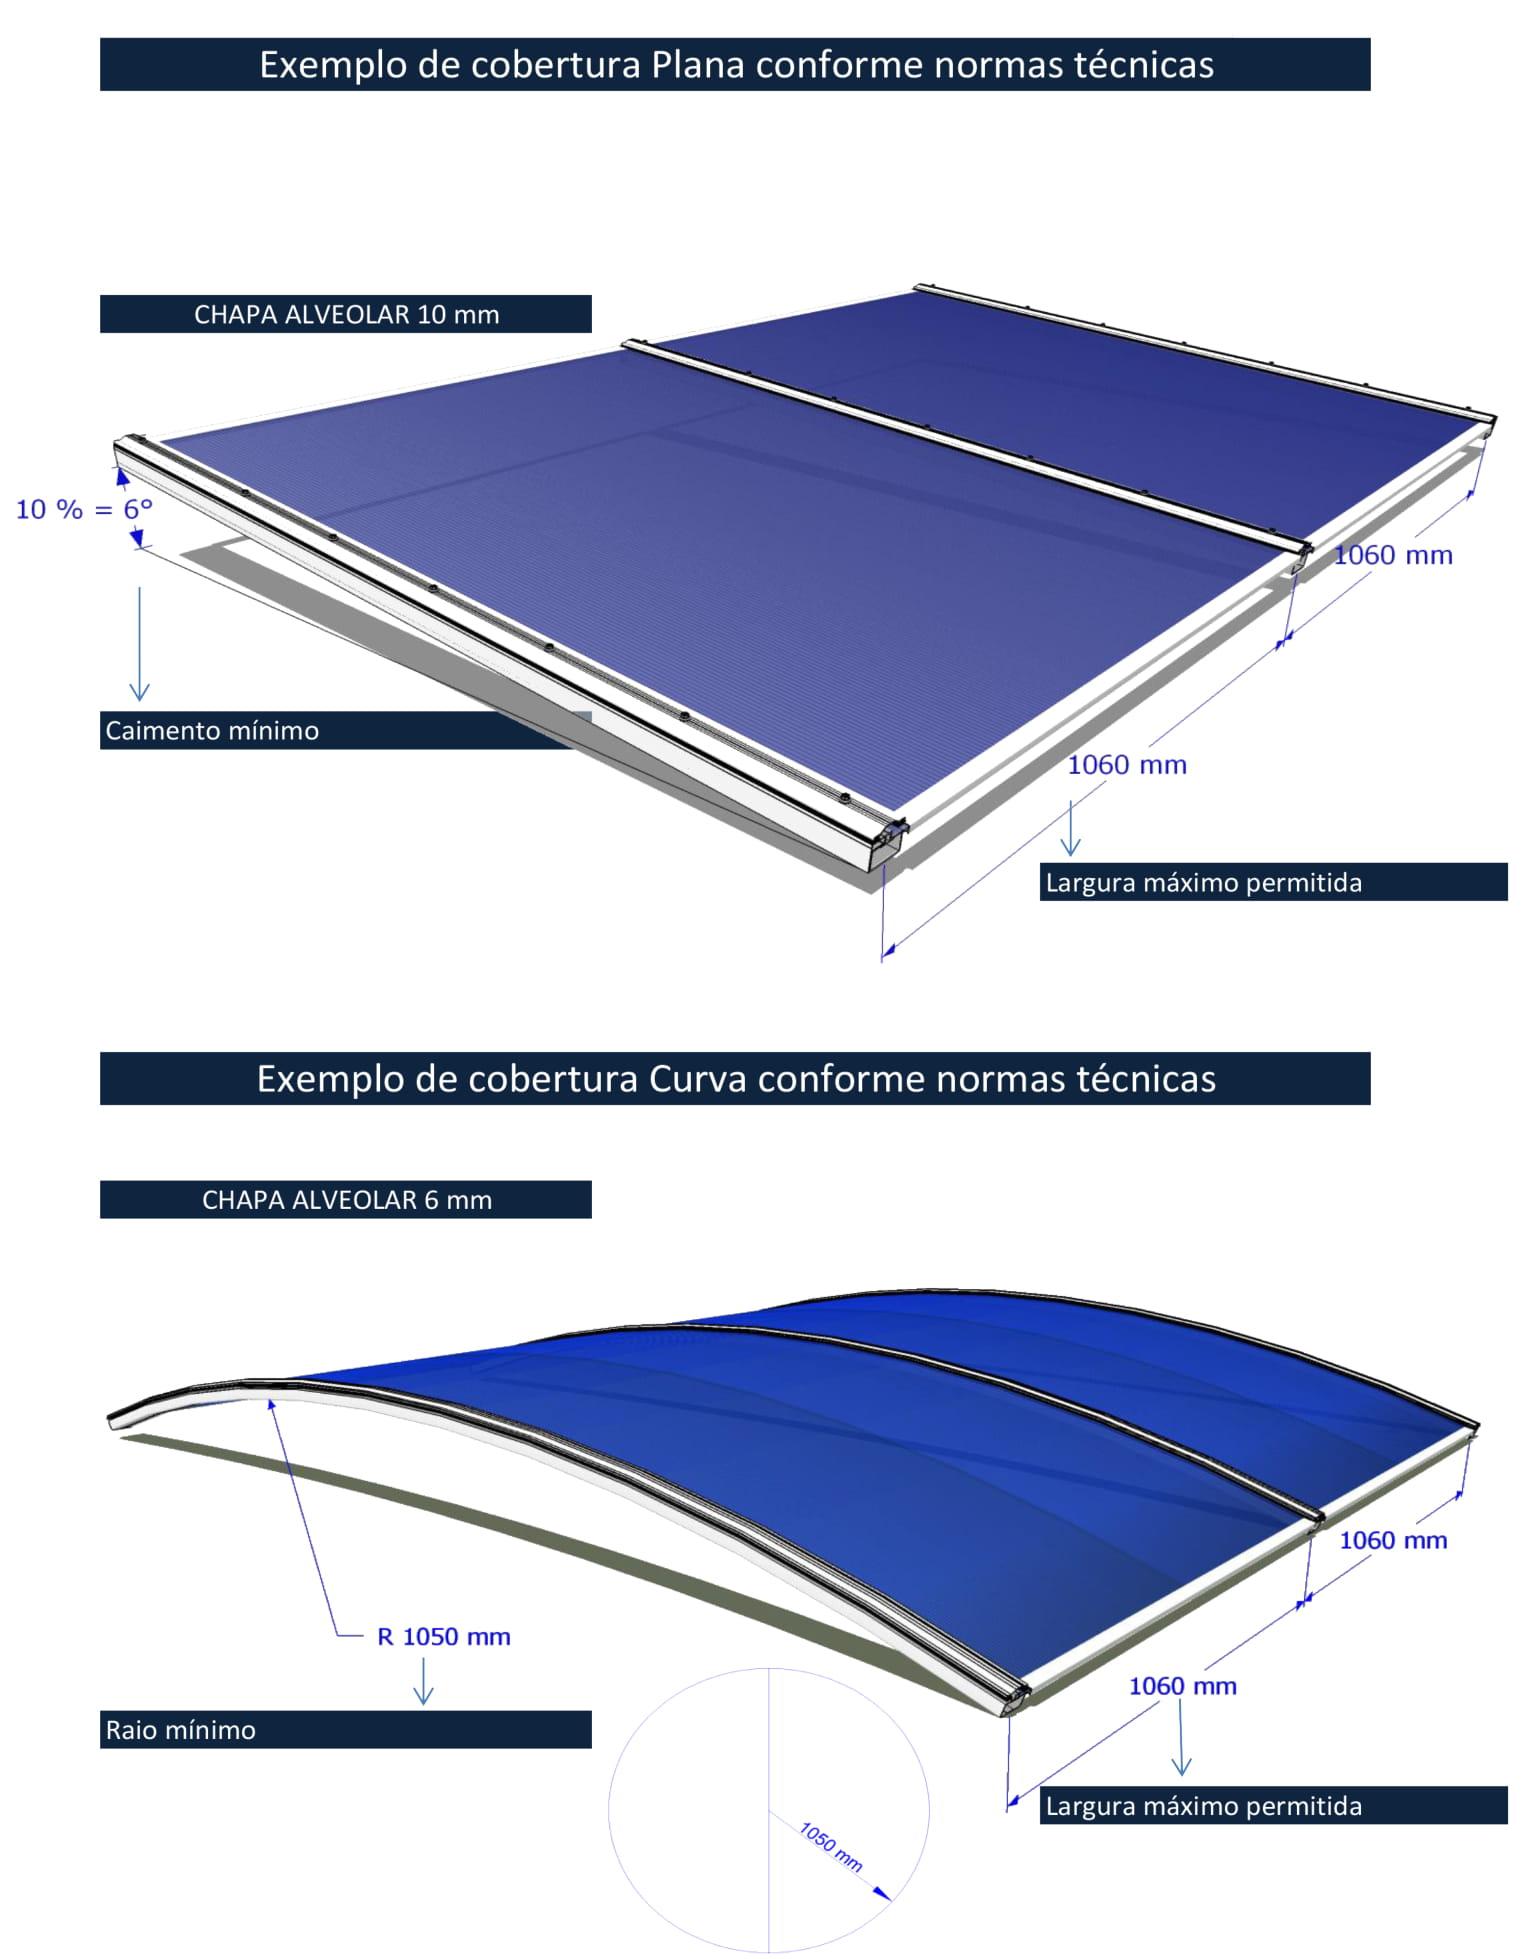 3 Dados Técnicos Chapas Alveolares 6 e 10 mm - POLYSOLUTION - Distanciamento entre apoios coberturas retas e curvas